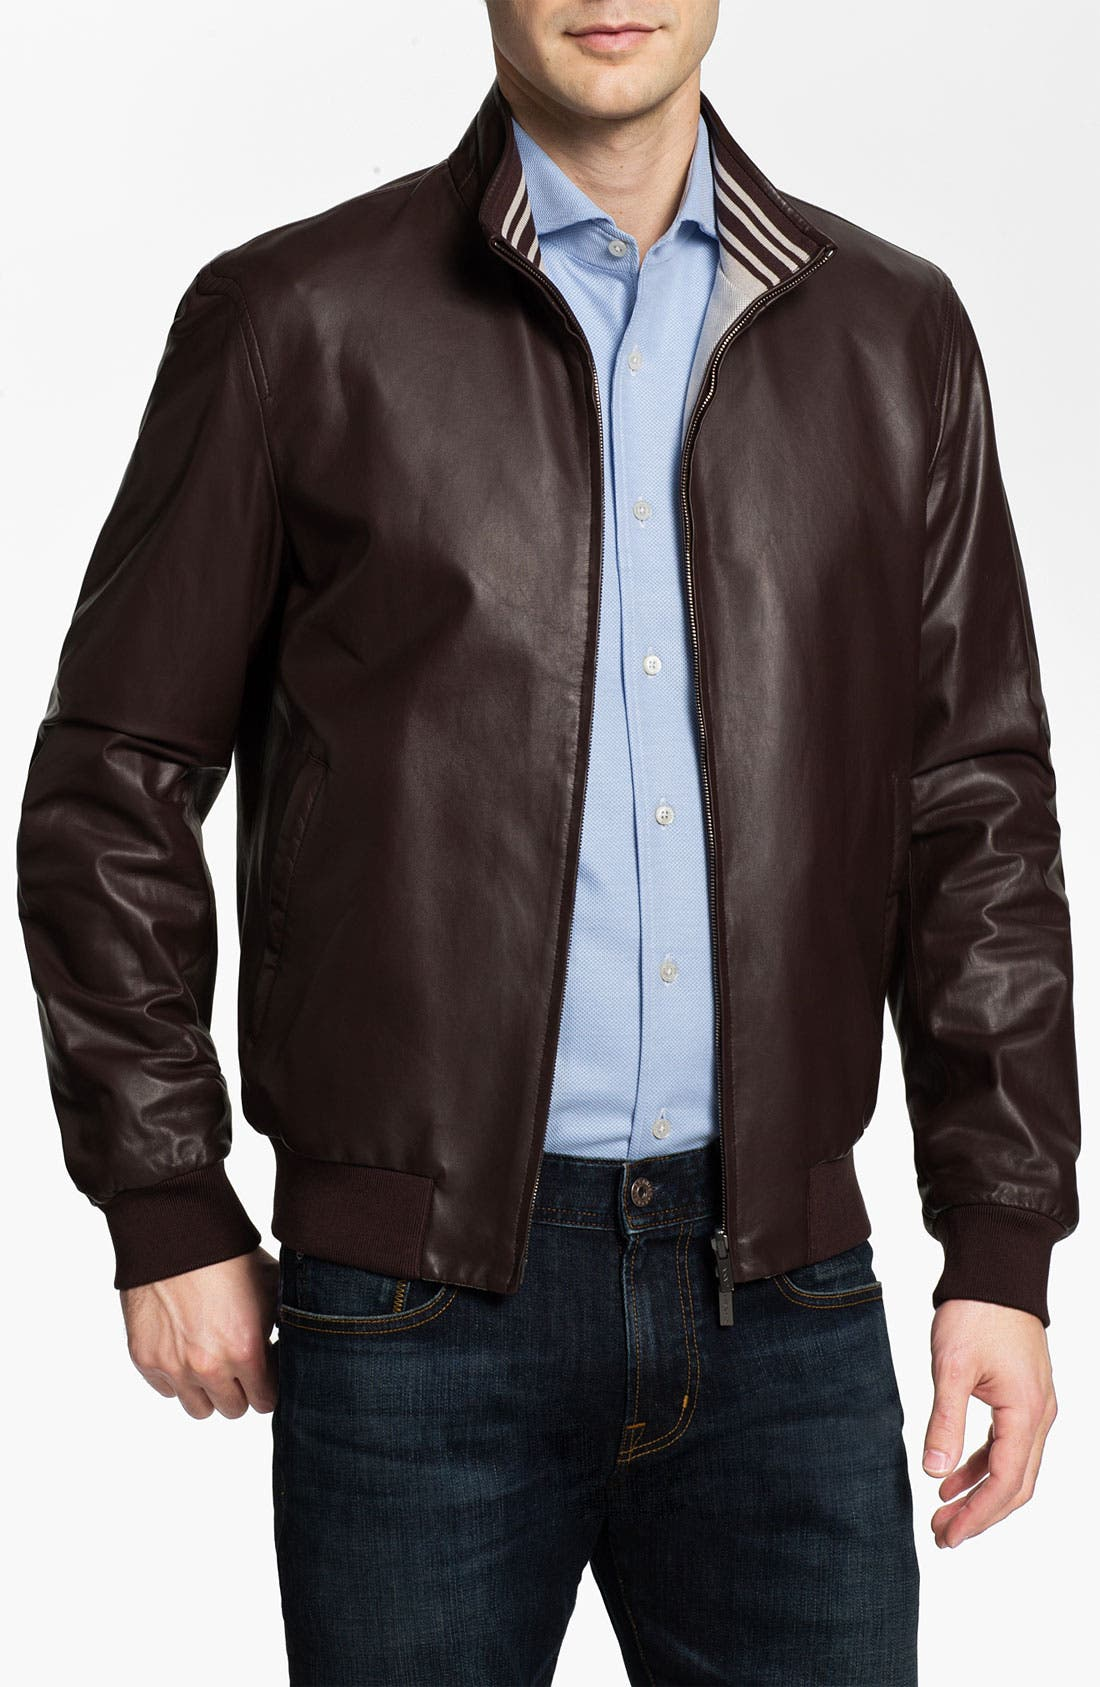 Alternate Image 1 Selected - Canali Reversible Leather Jacket